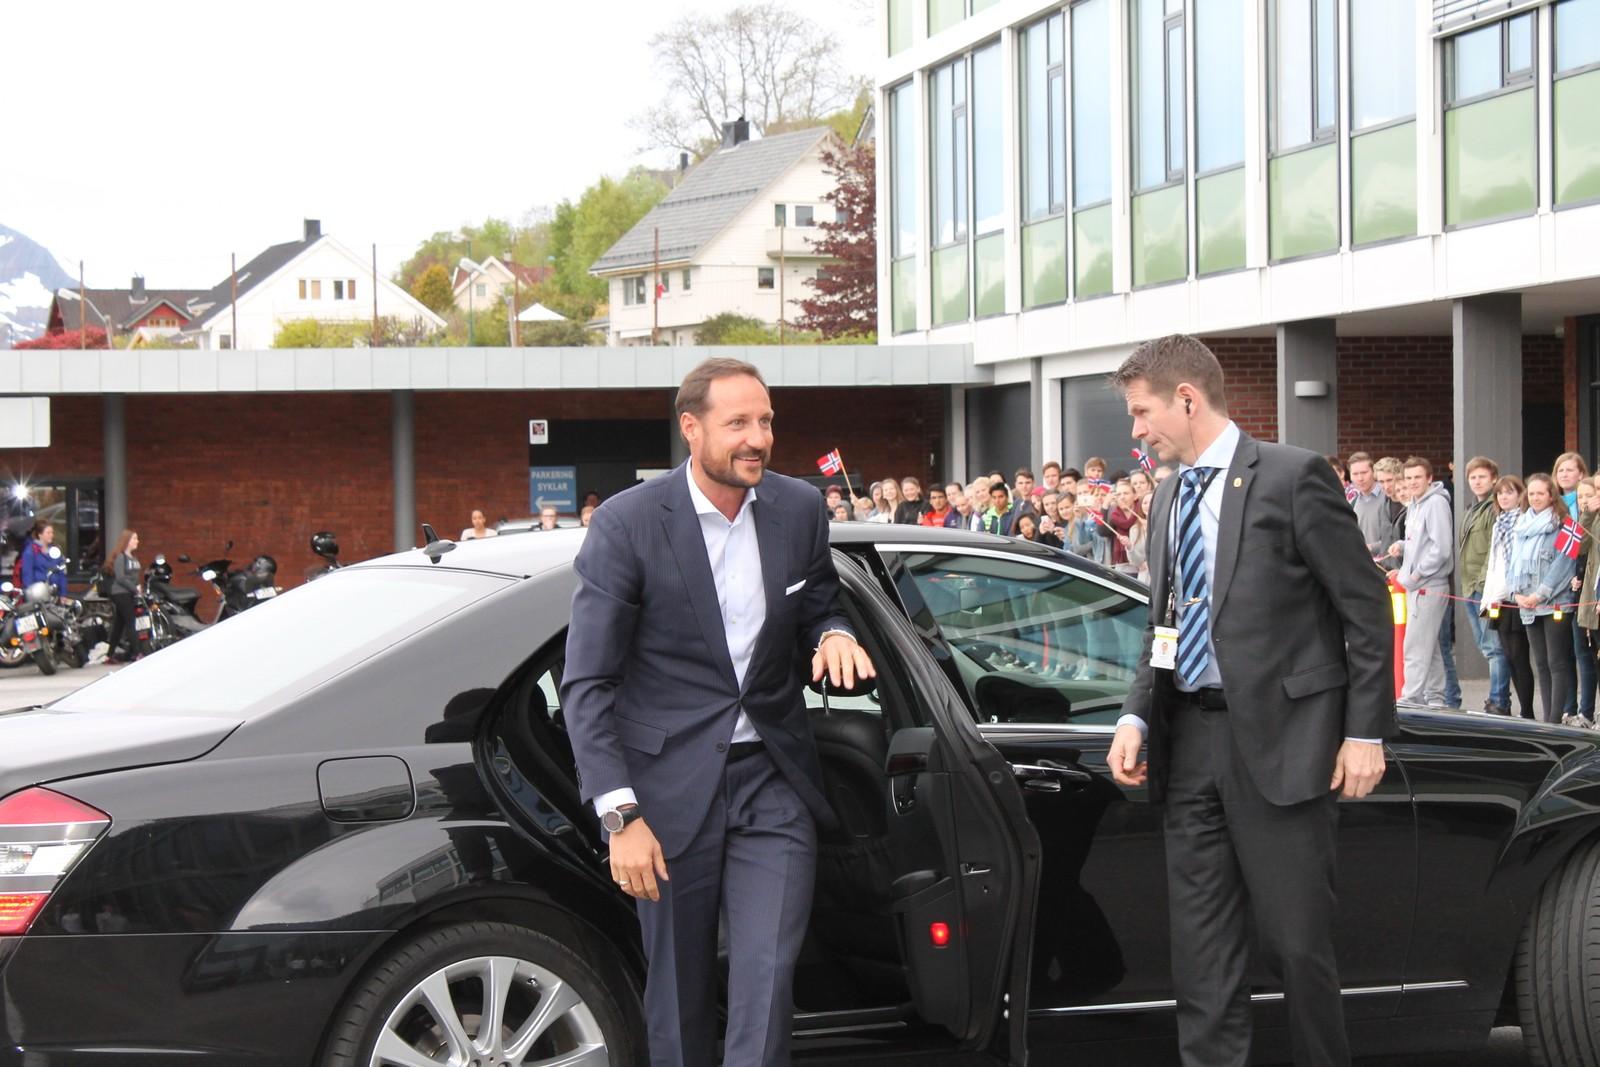 Kronprins Haakon Magnus besøker Volda videregående skole.